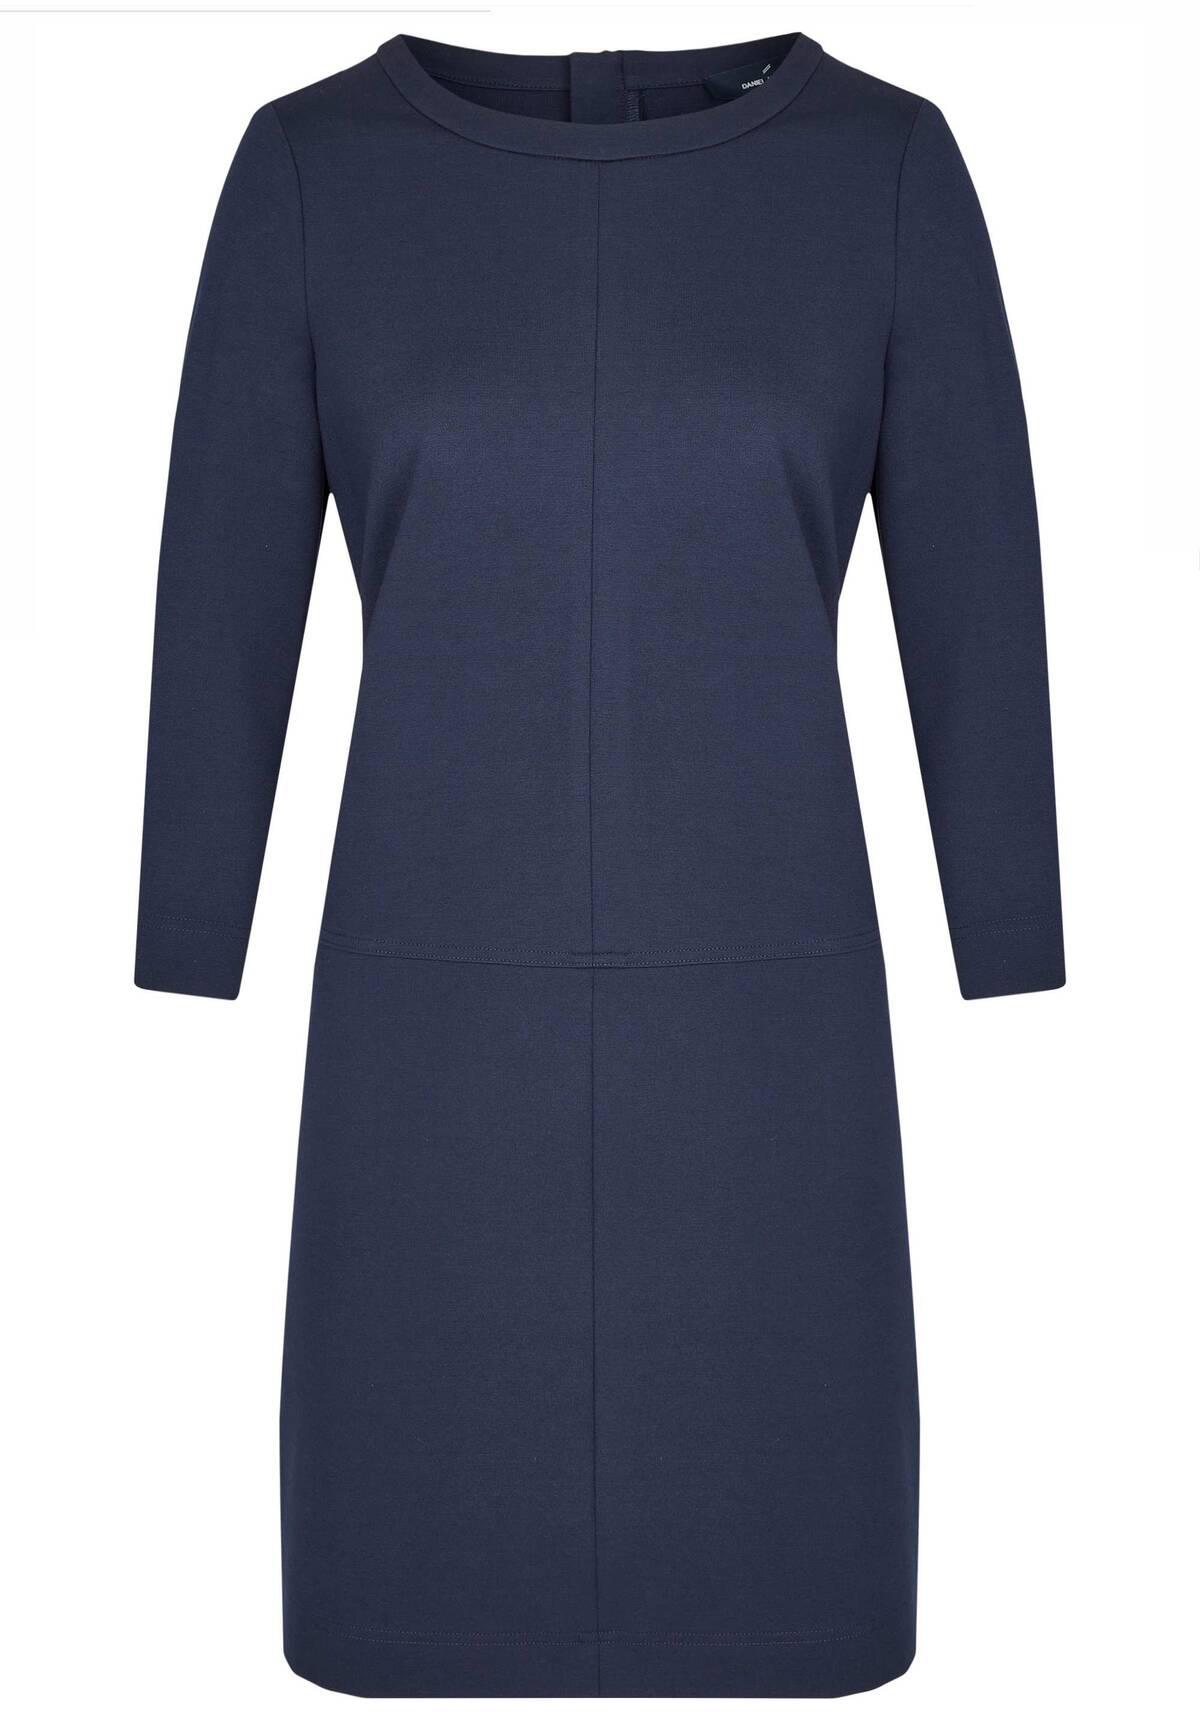 Modernes Kleid / Dress